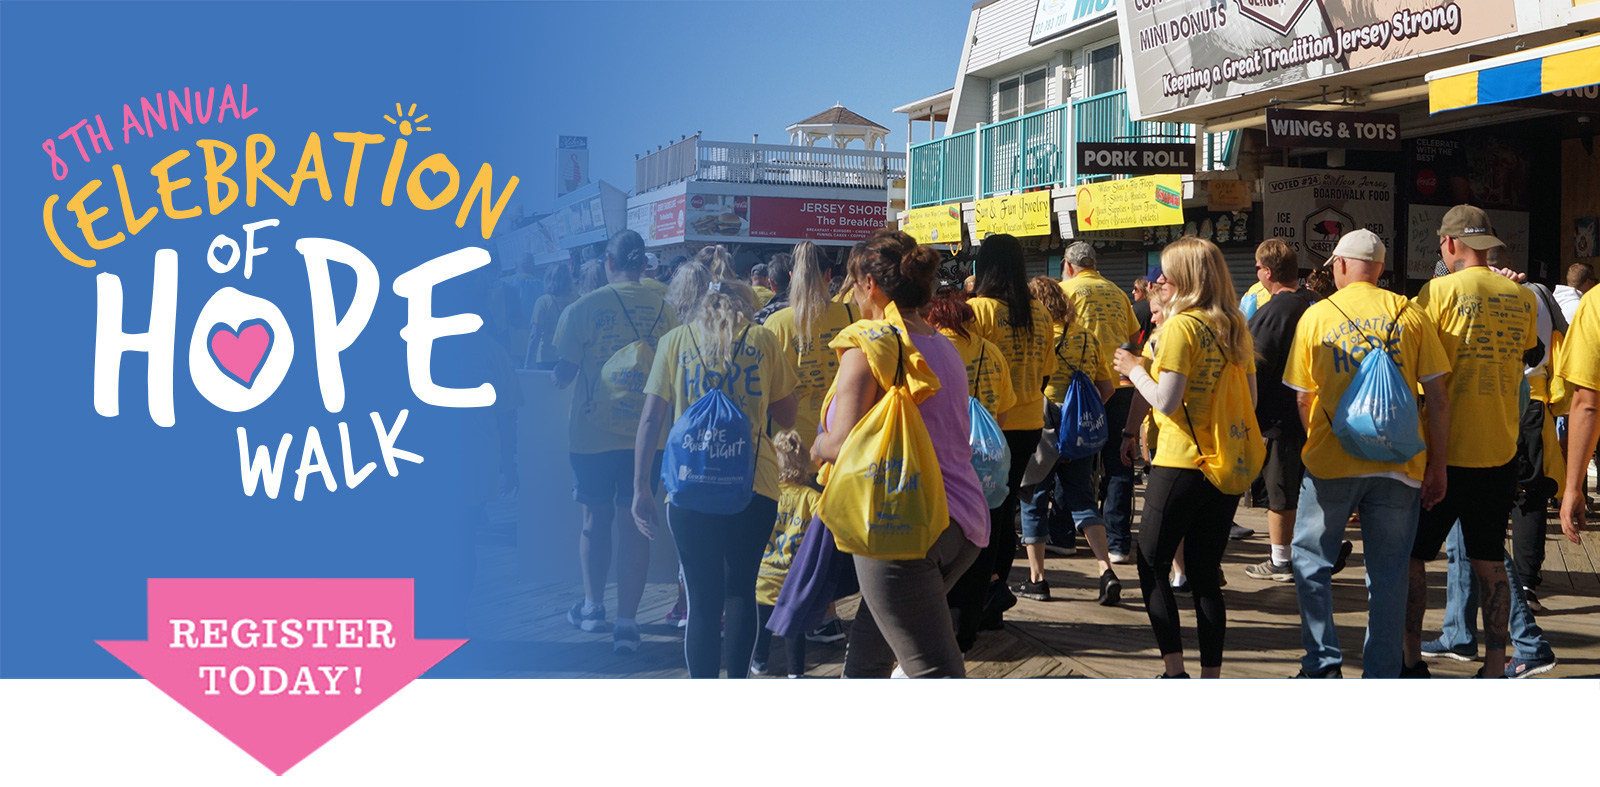 8Th Annual Celebration of HOPE Walk